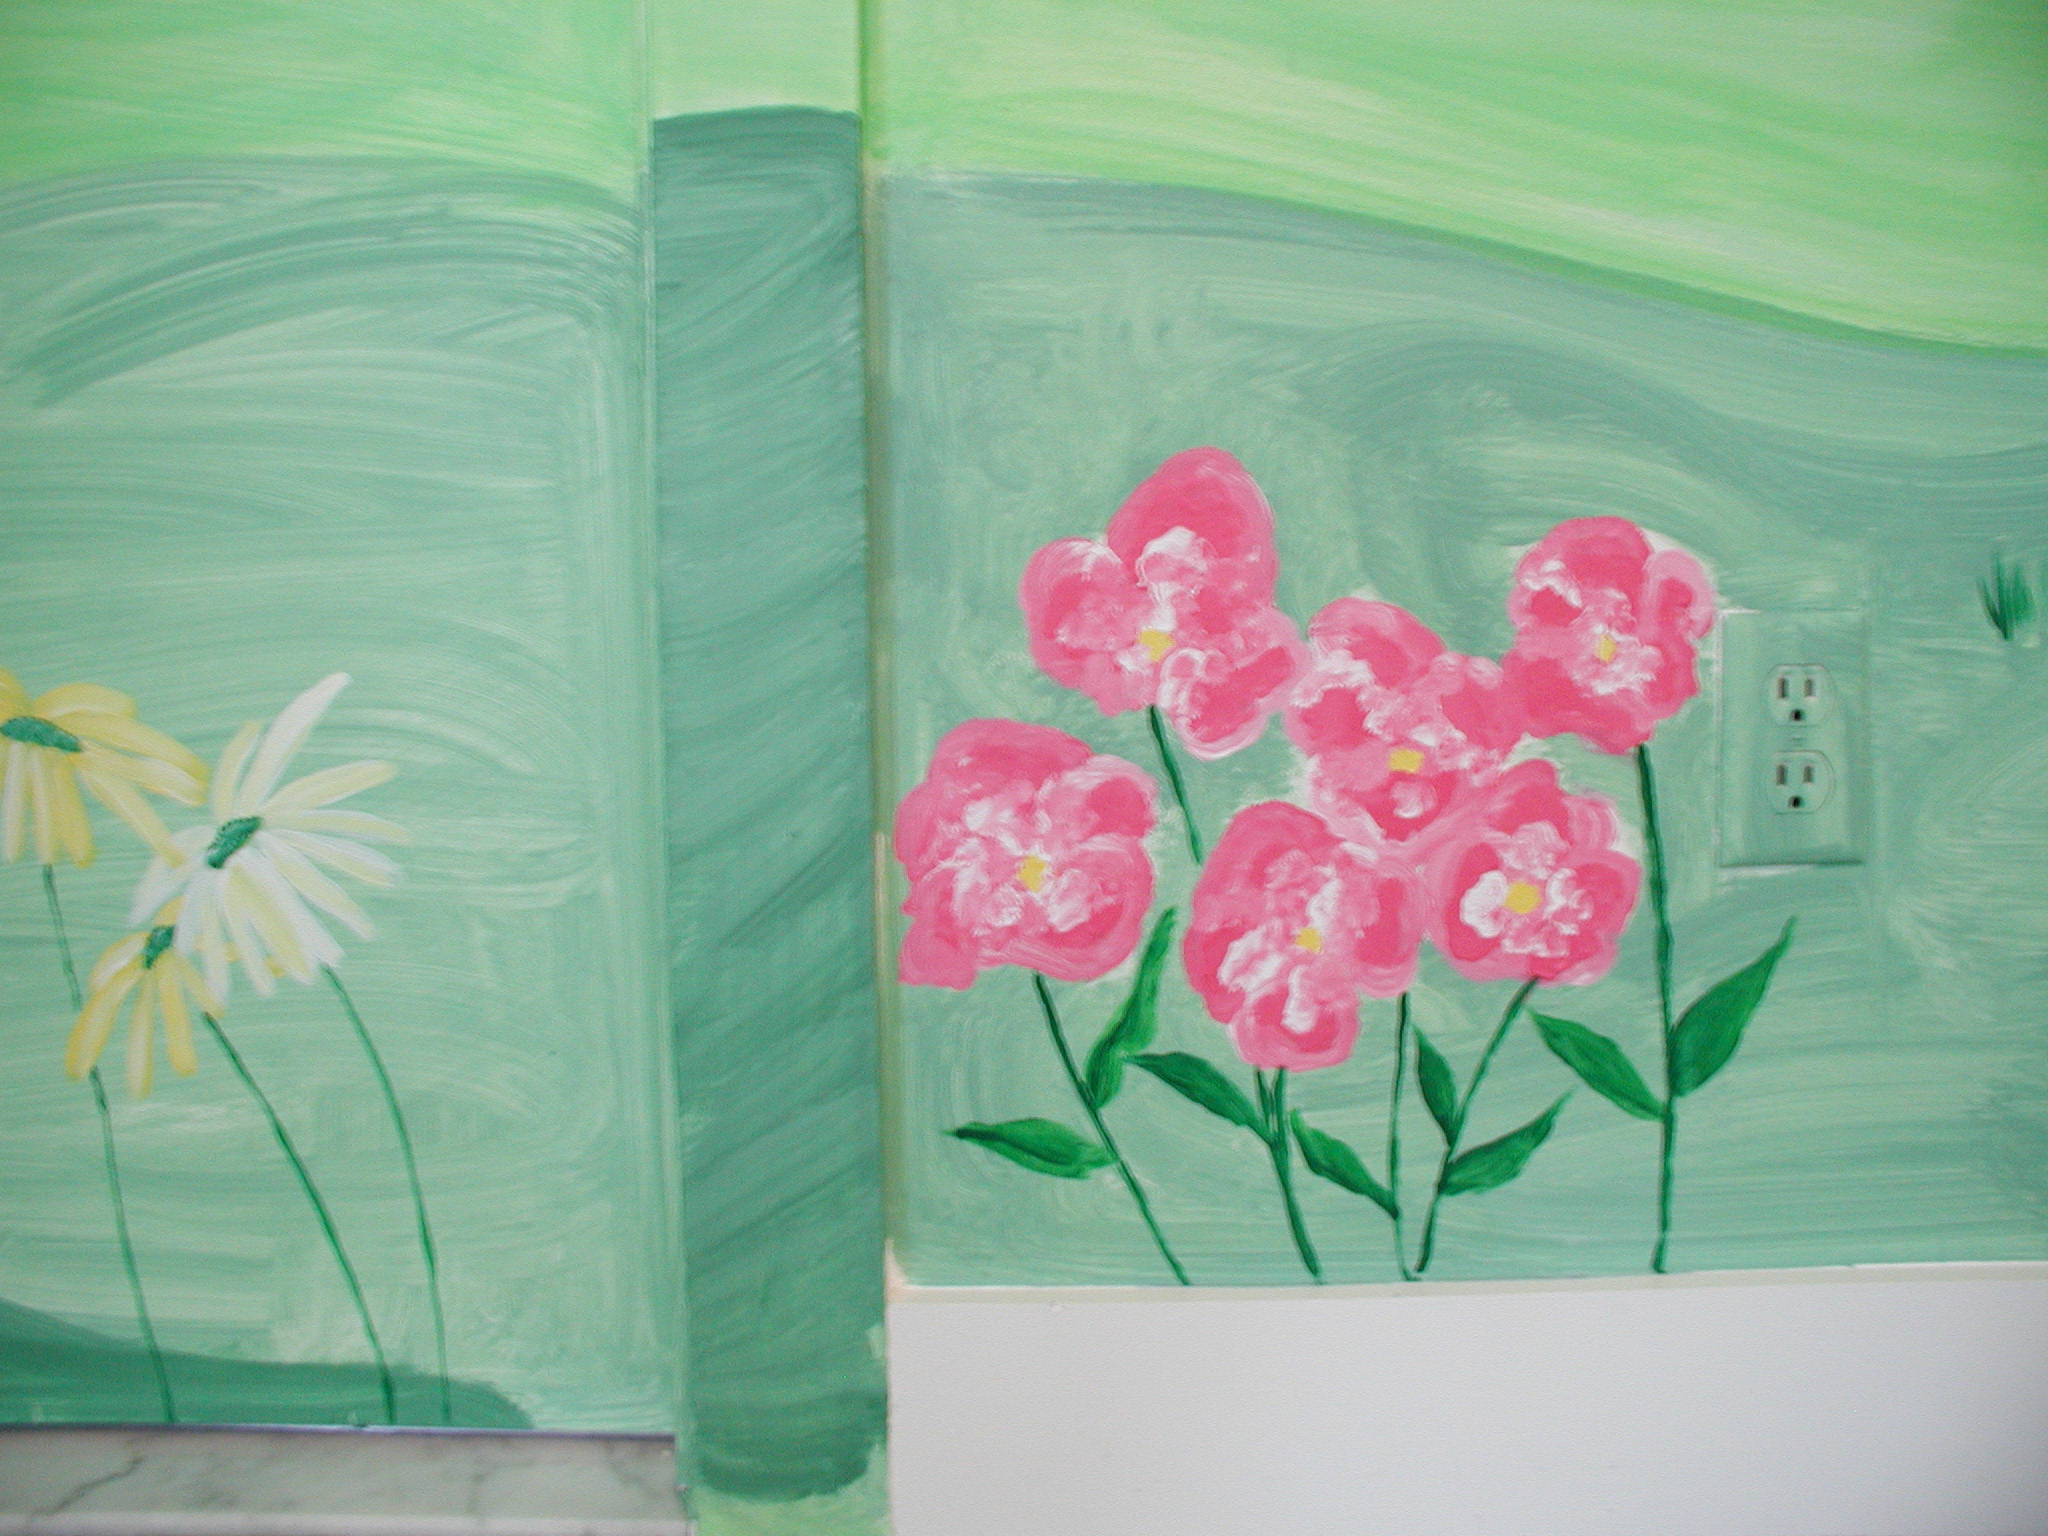 pinkflowerdaisydetail.jpg